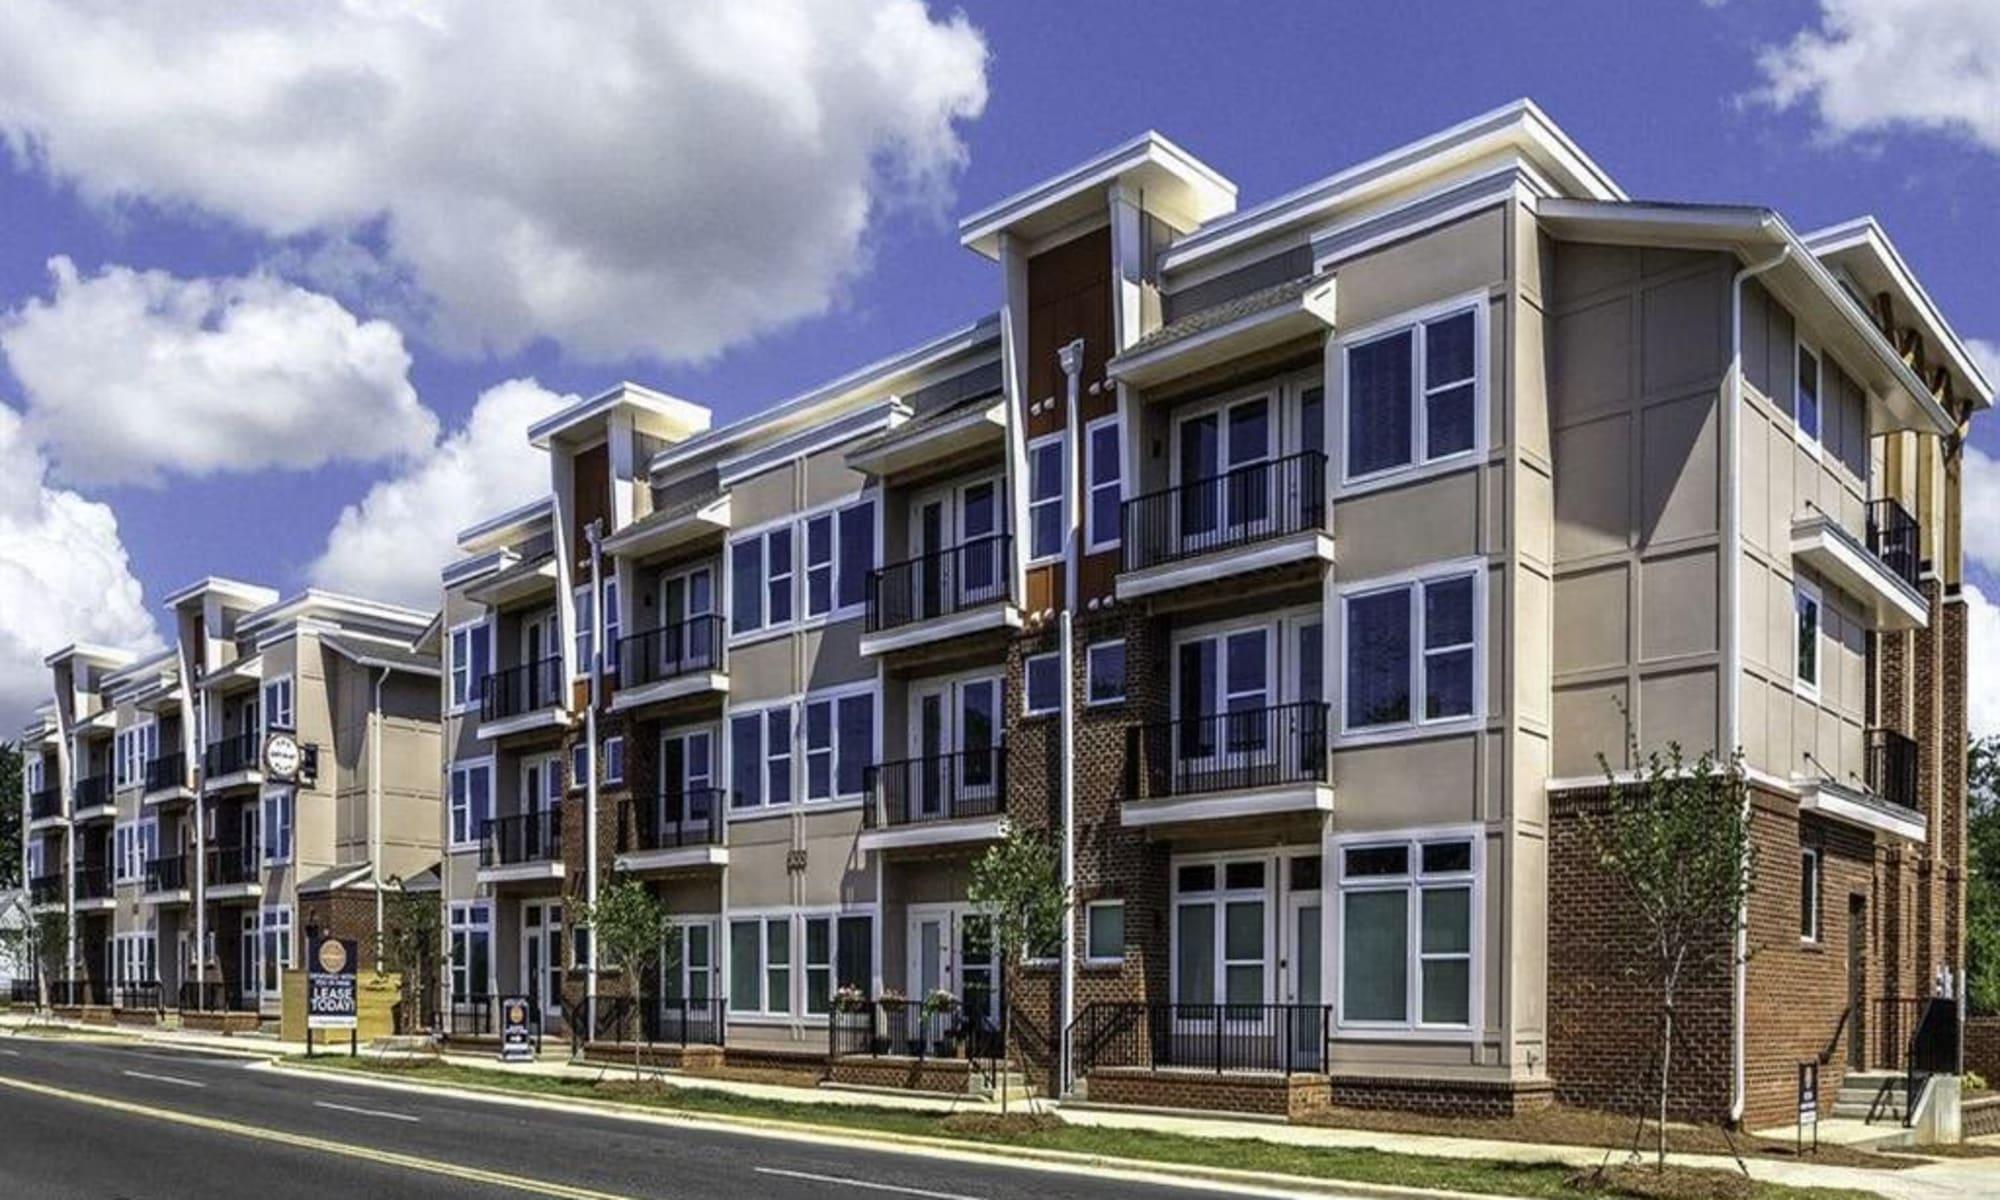 Apartments at 300 Optimist Park in Charlotte, North Carolina